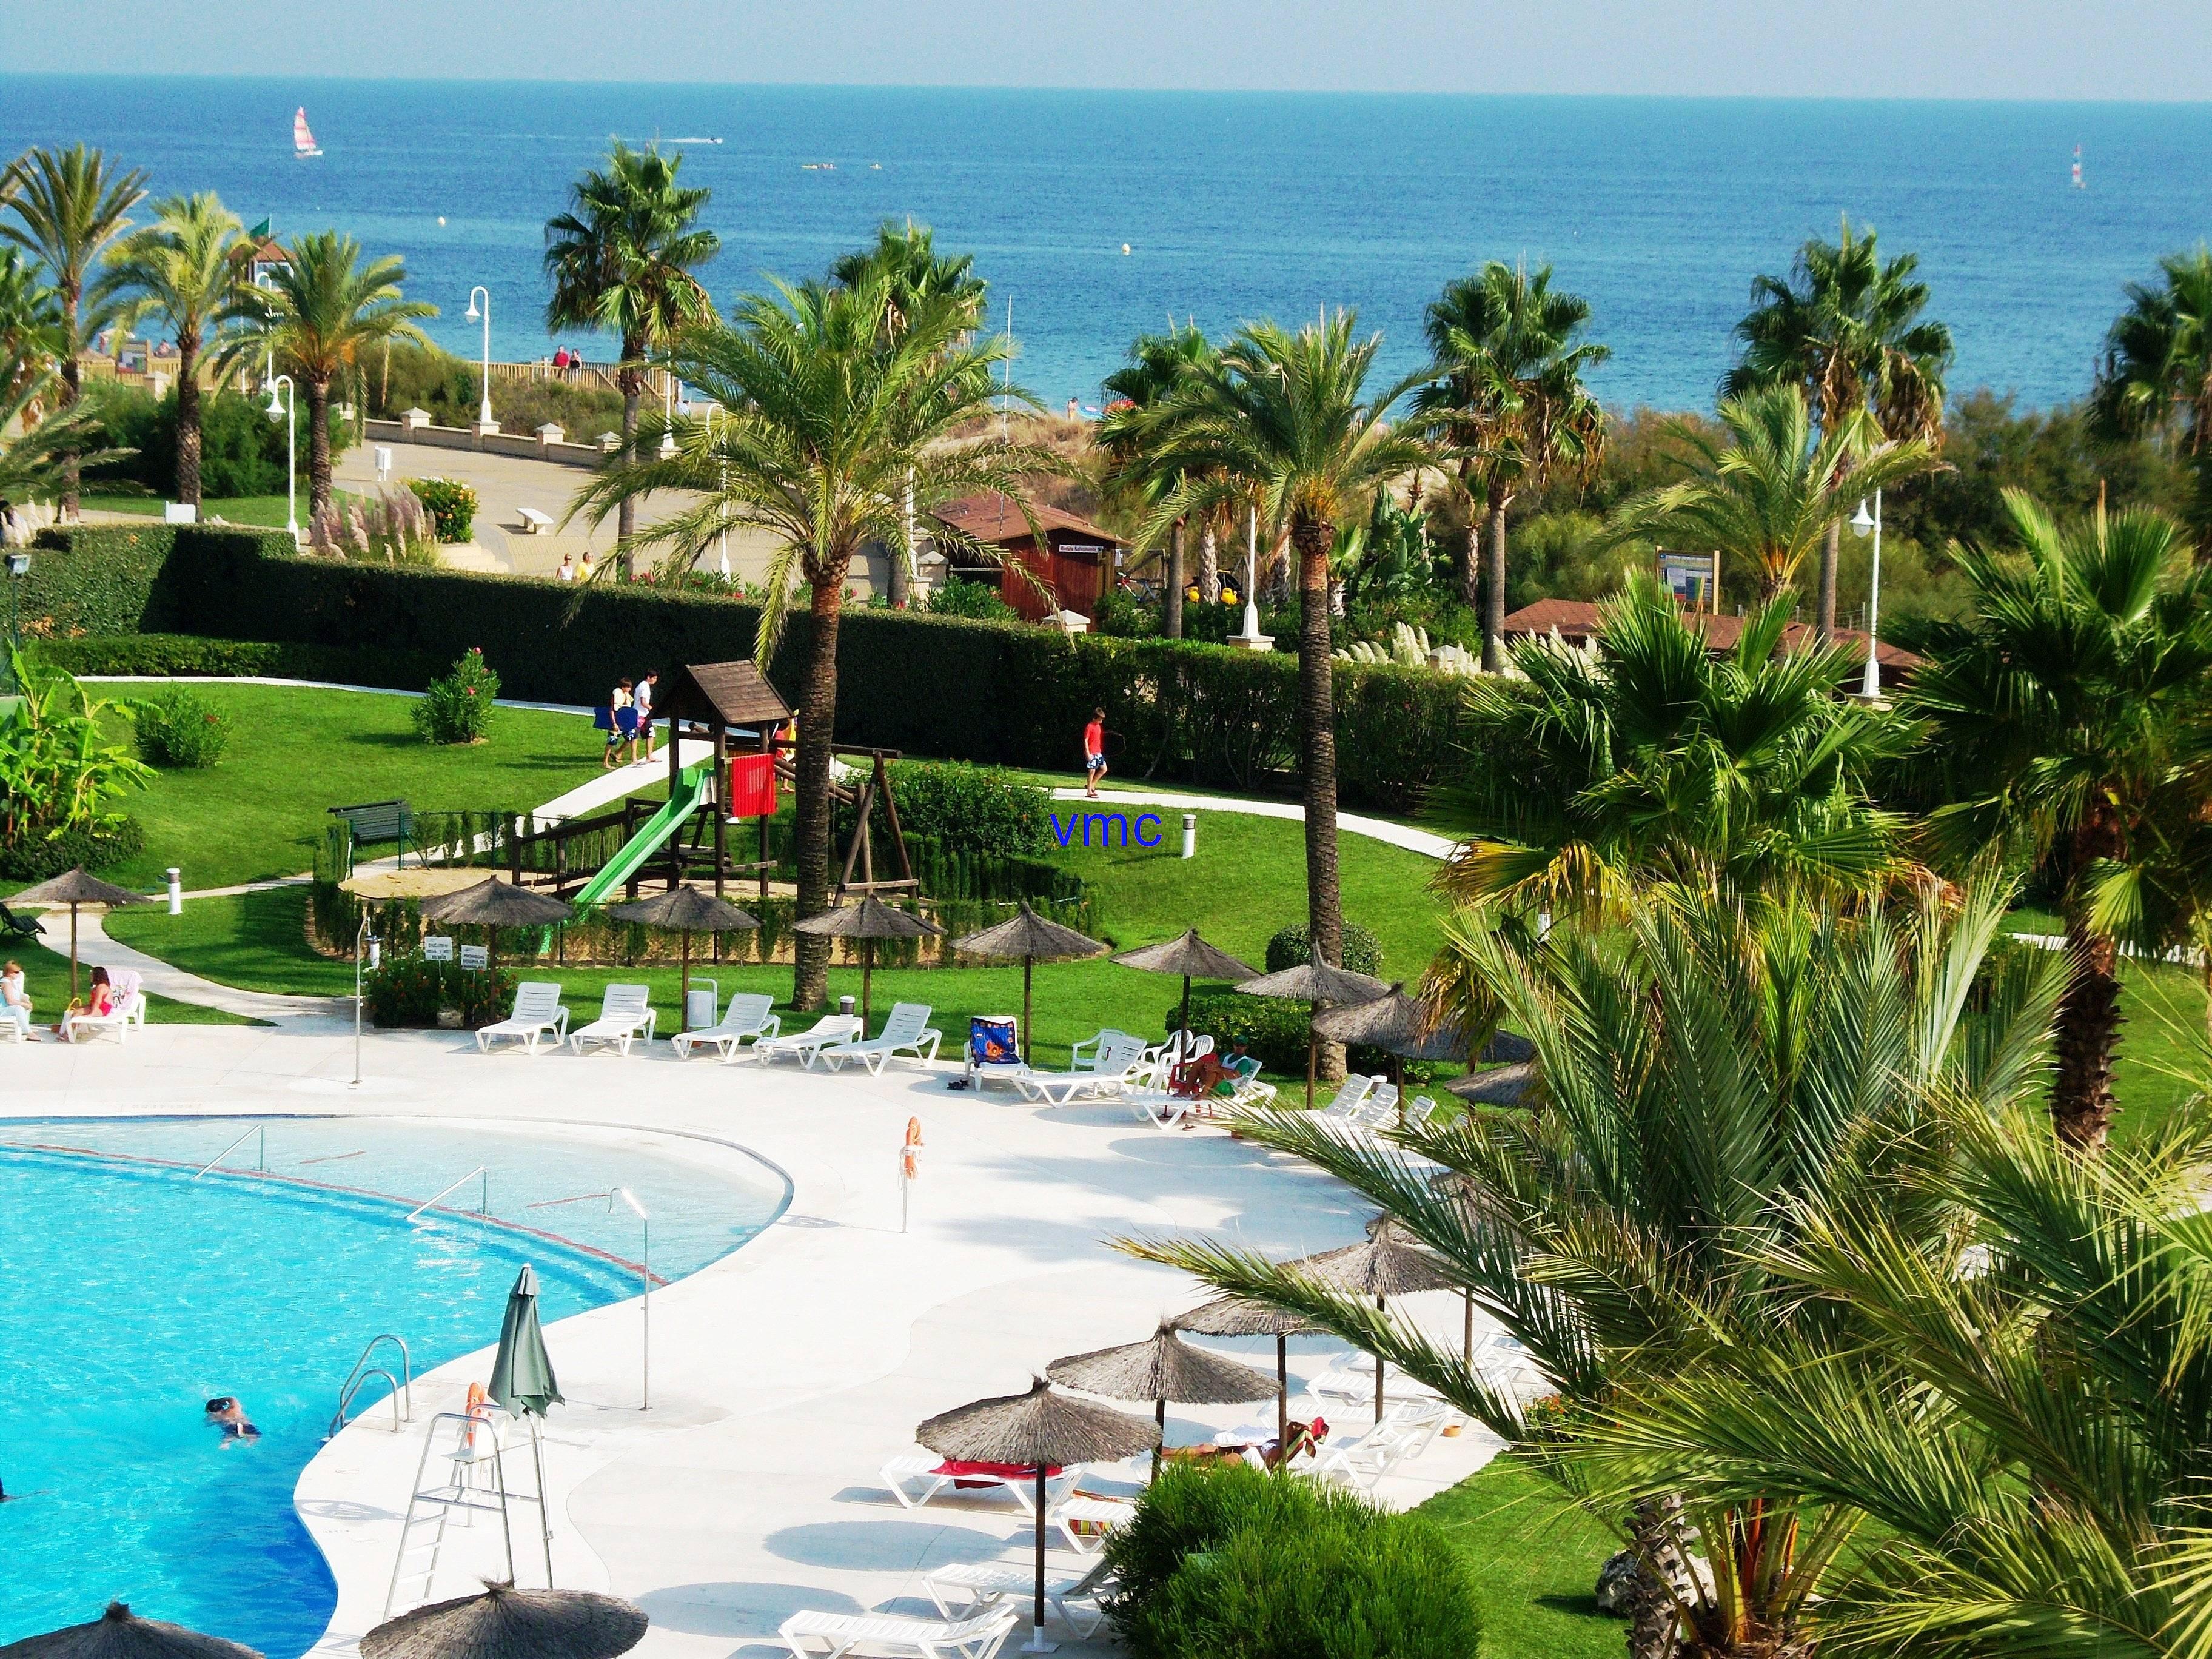 Appartement pour 4 6 personnes avec piscine islantilla i - Rentalia islantilla ...